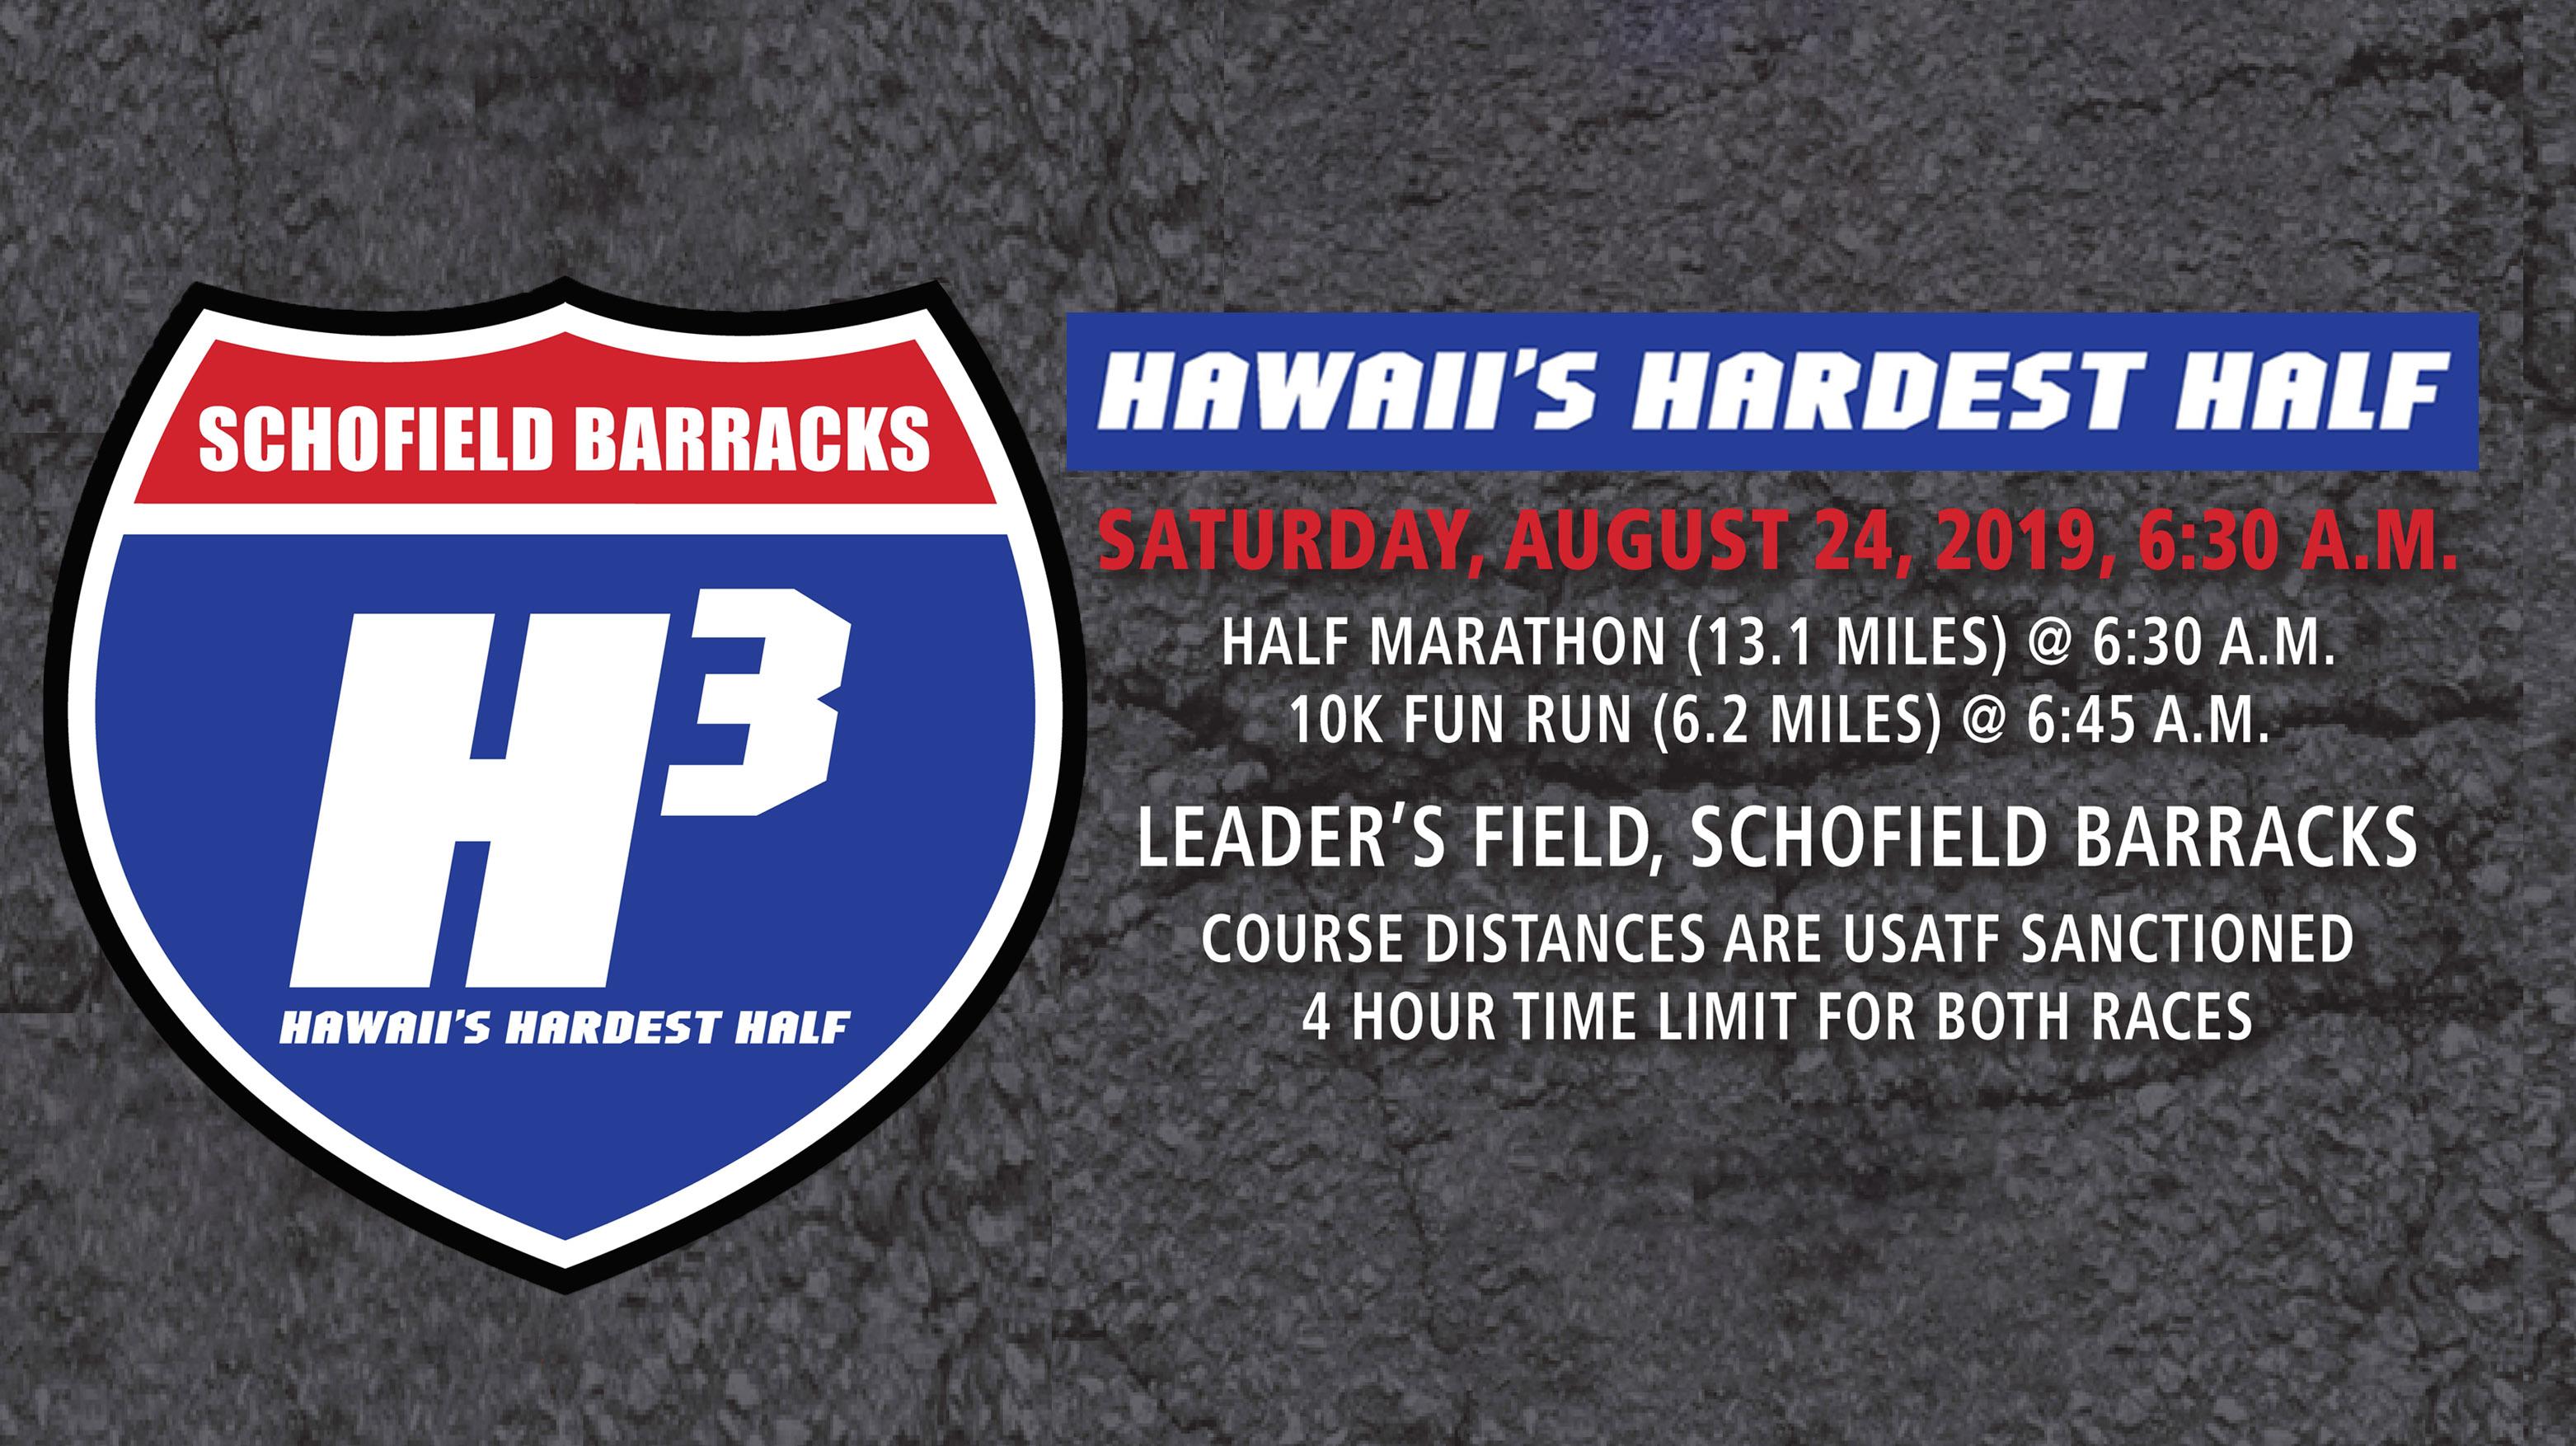 Hawaii's Hardest Half Race